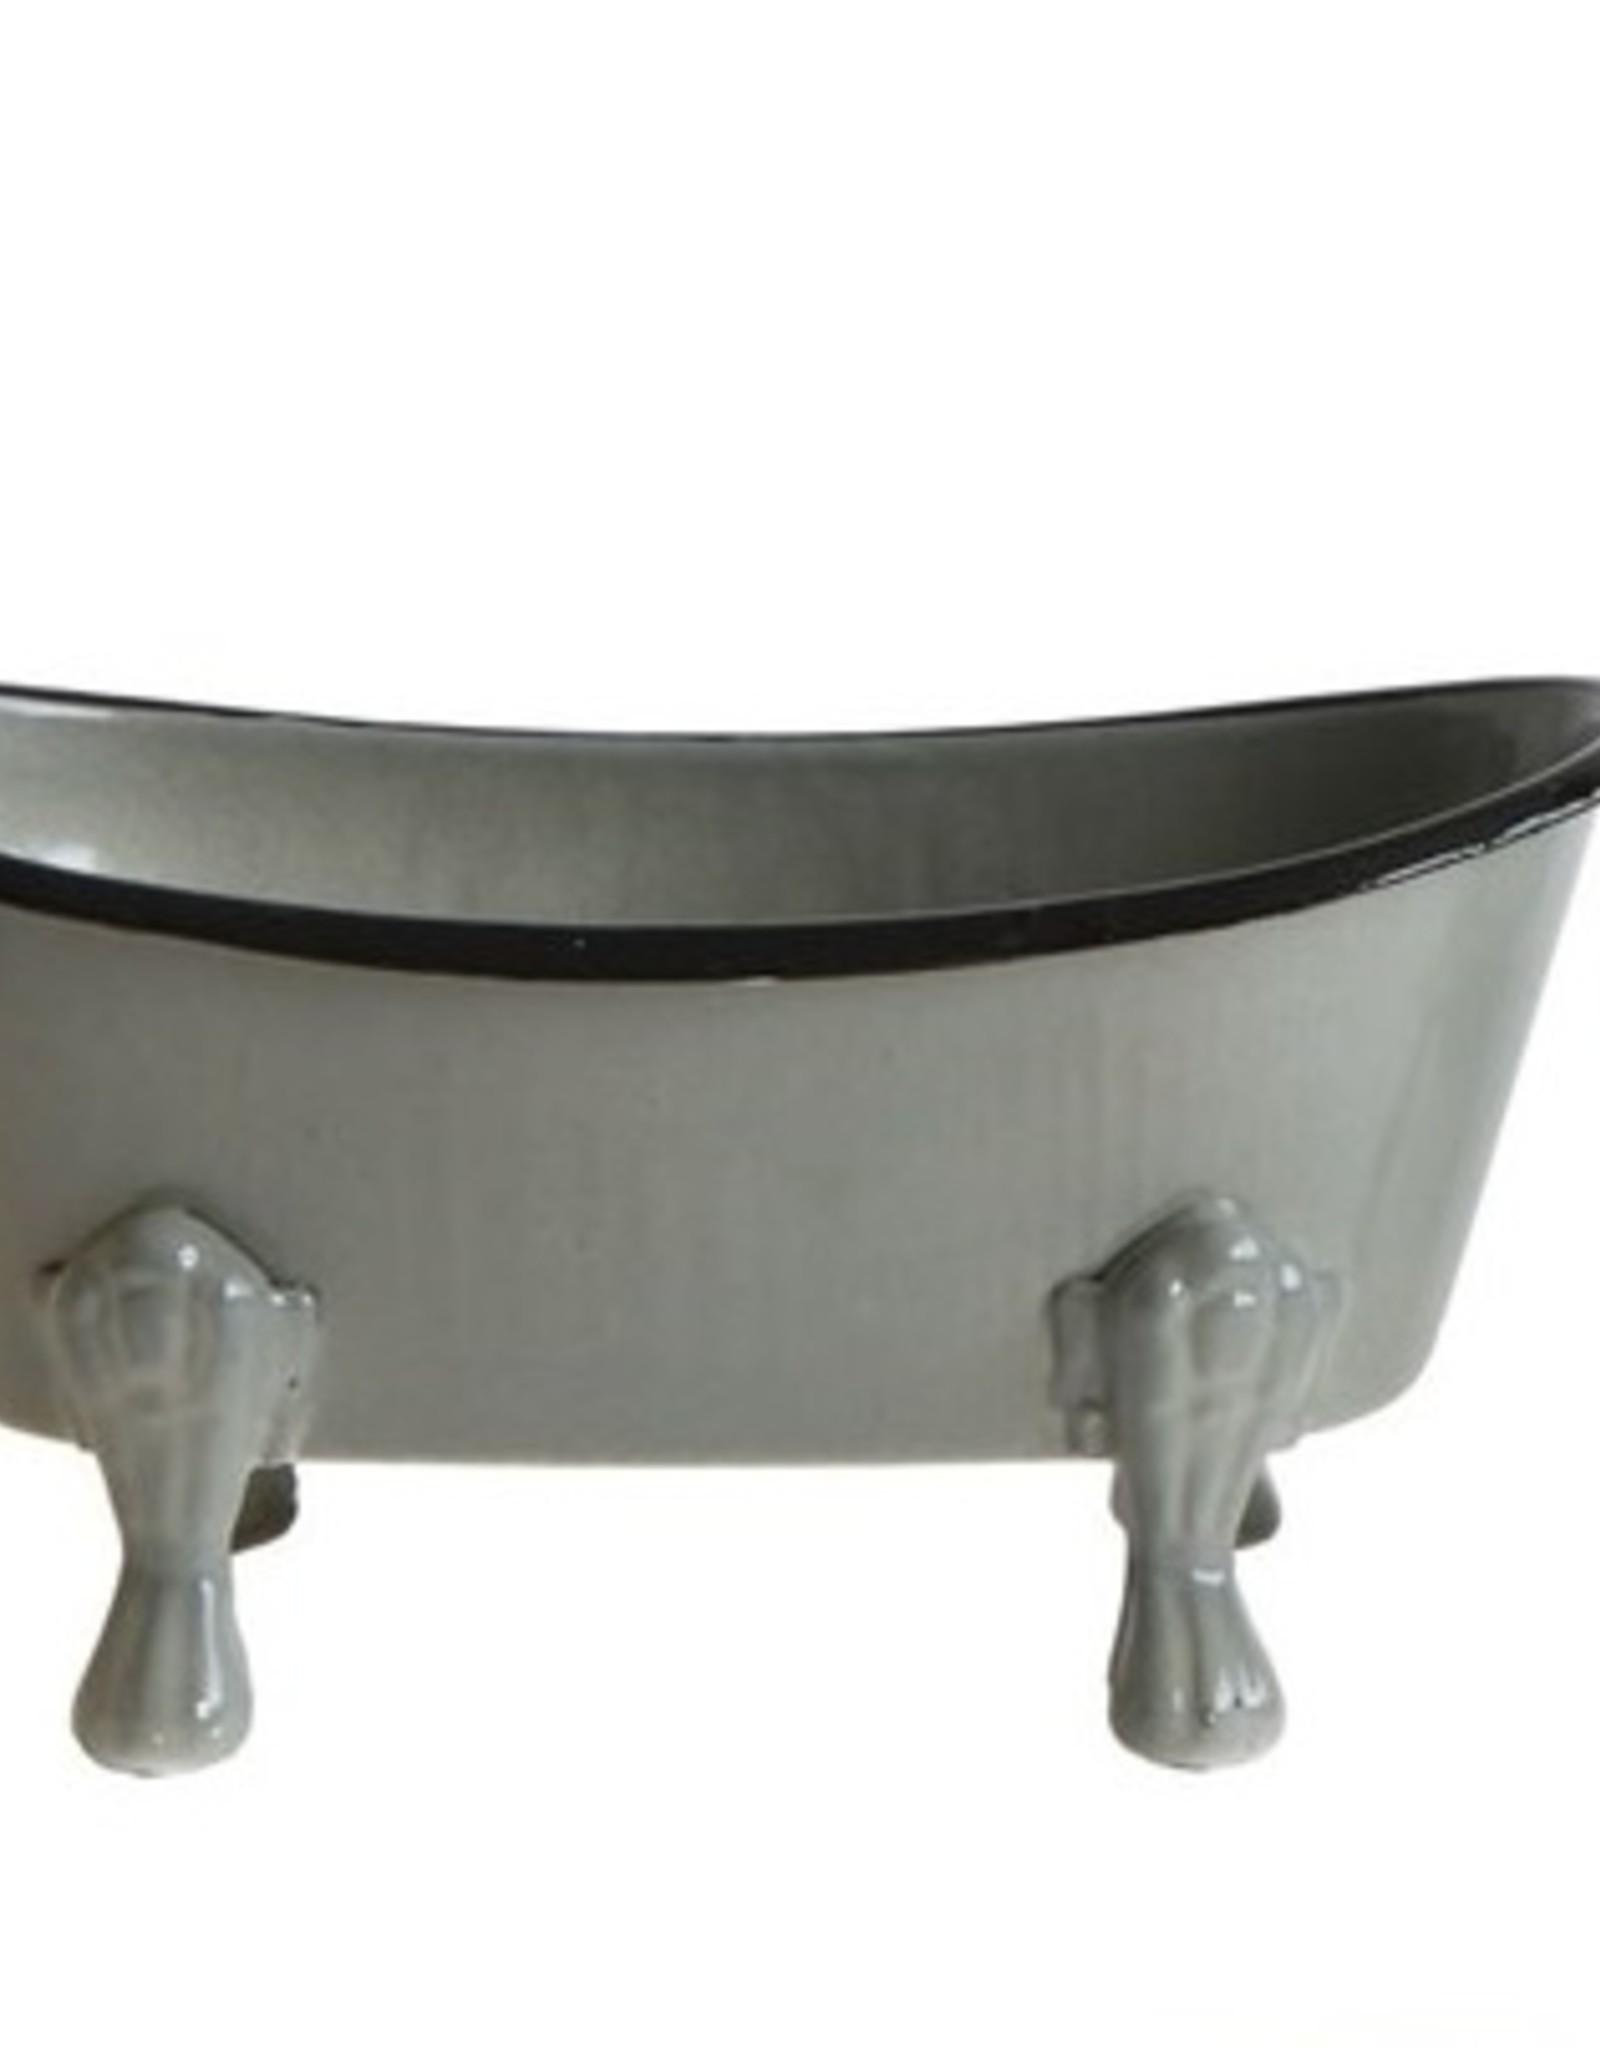 Wink Bathtub Soap Dish